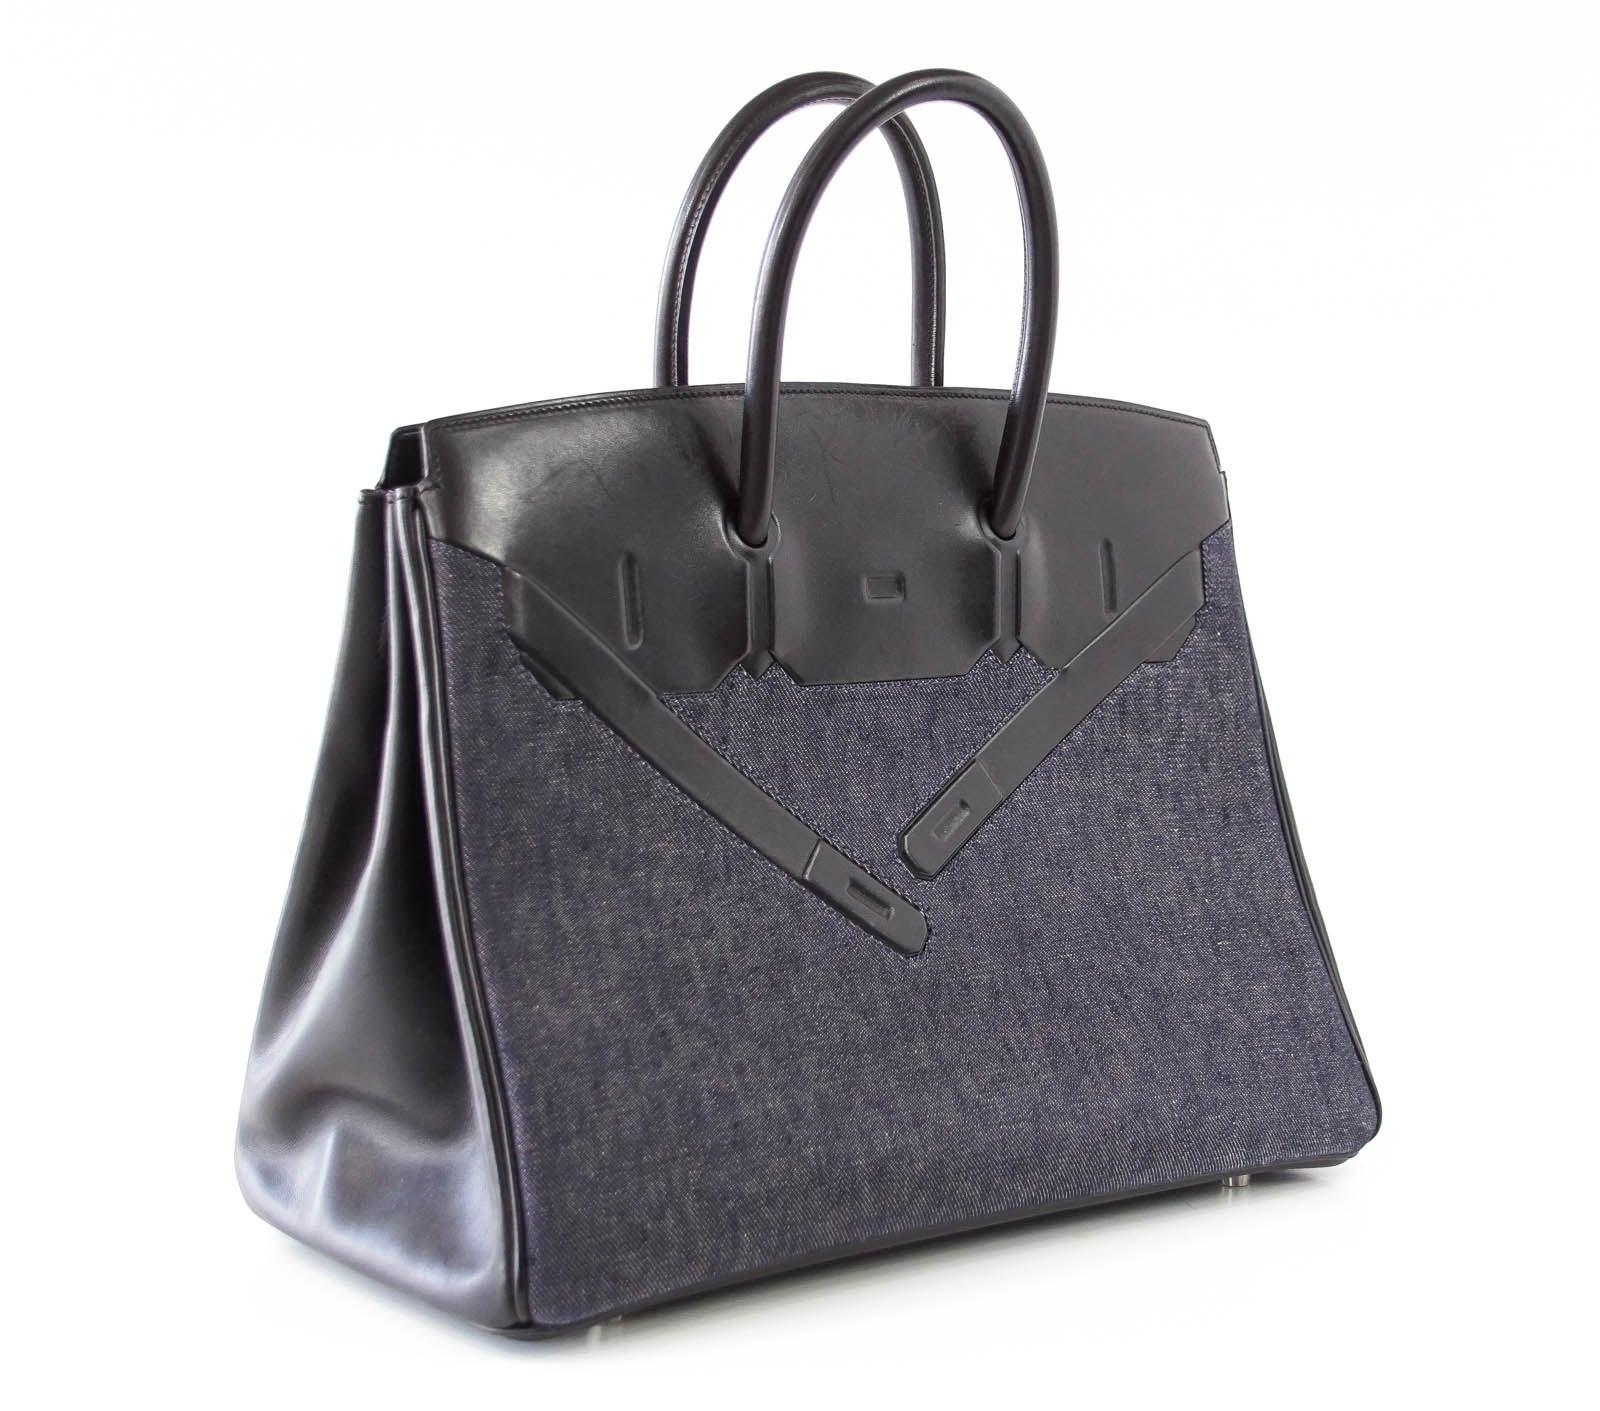 e104b37ccea Hermes Birkin 35 Bag Rare Limited Edition Shadow Denim at 1stdibs